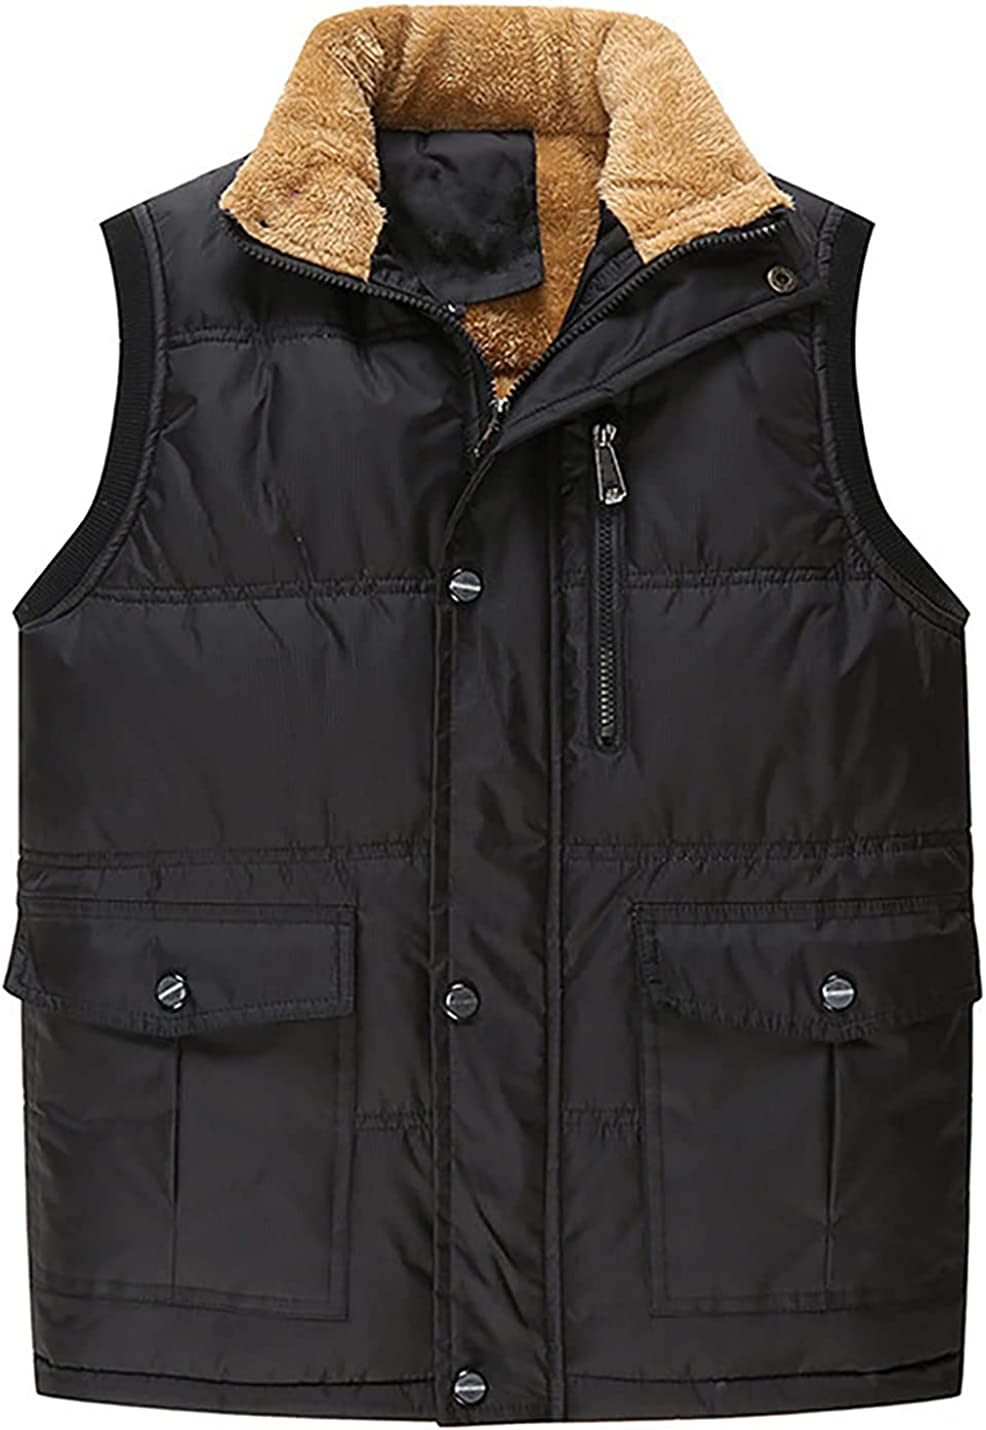 PEHMEA Men's Winter Warm Outdoor Padded Puffer Vest Thick Fleece Lined Safari Work Vests